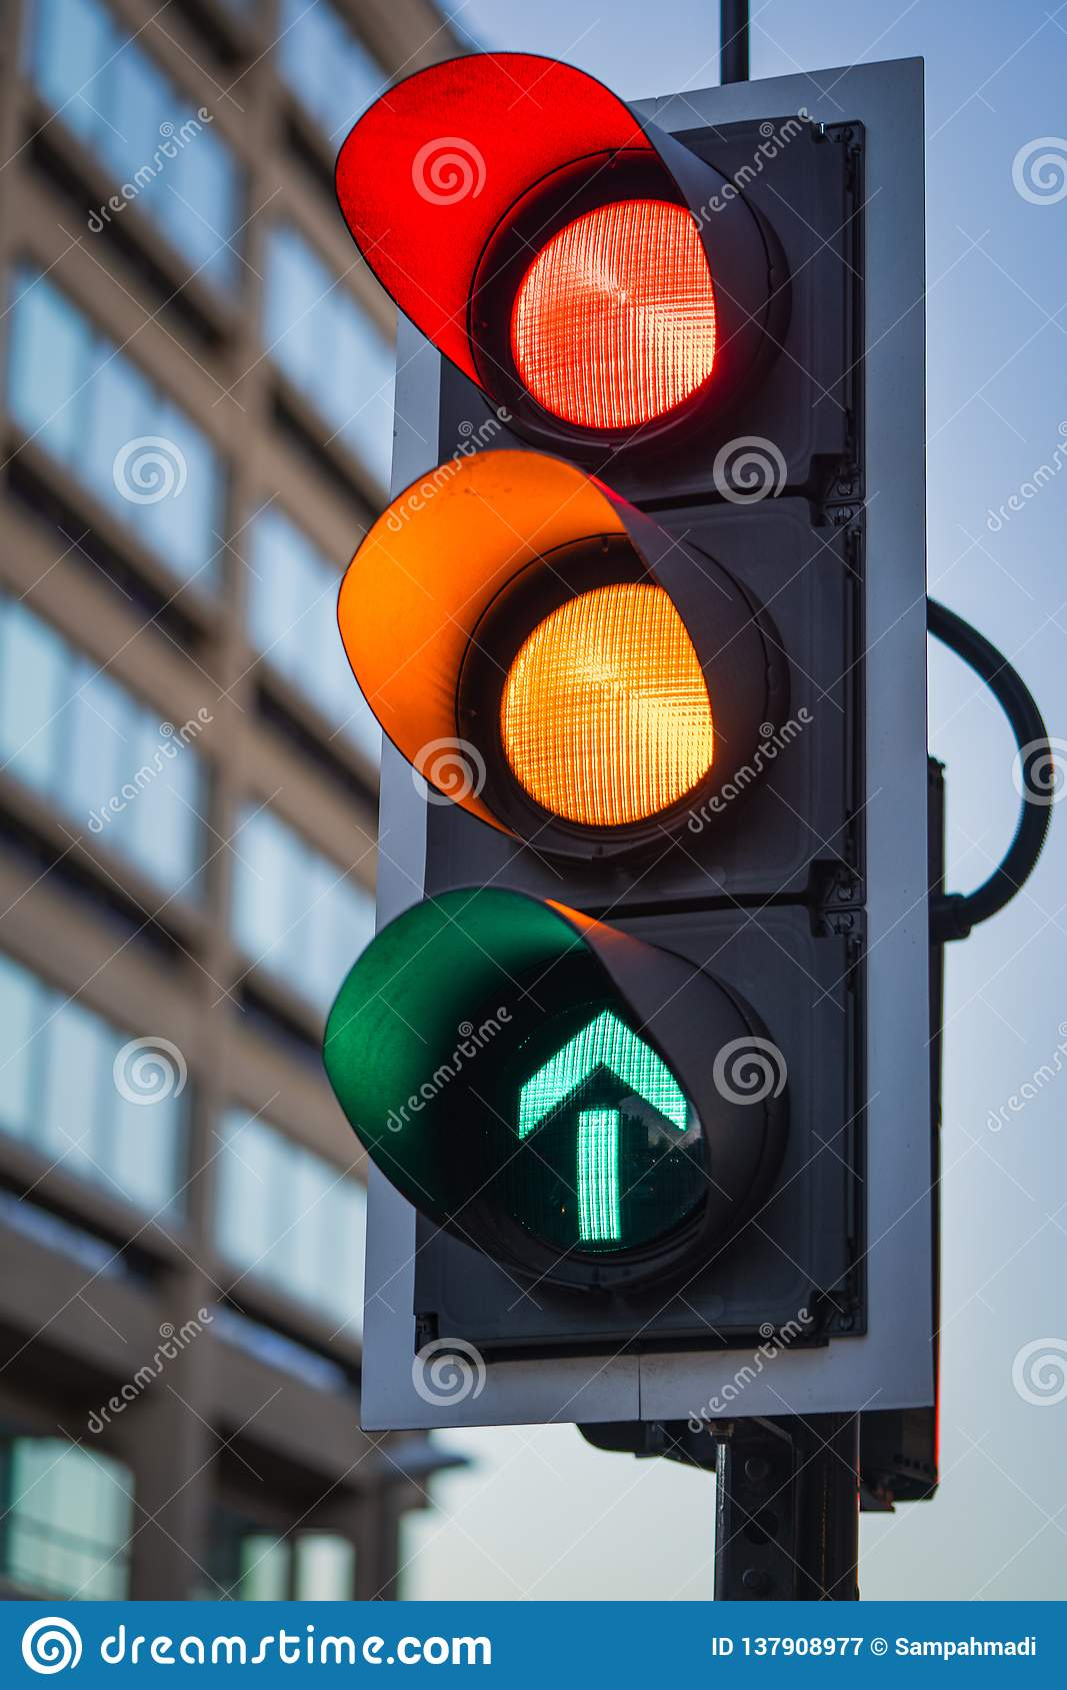 Red Amber Green Traffic Light Illuminated Stock Image